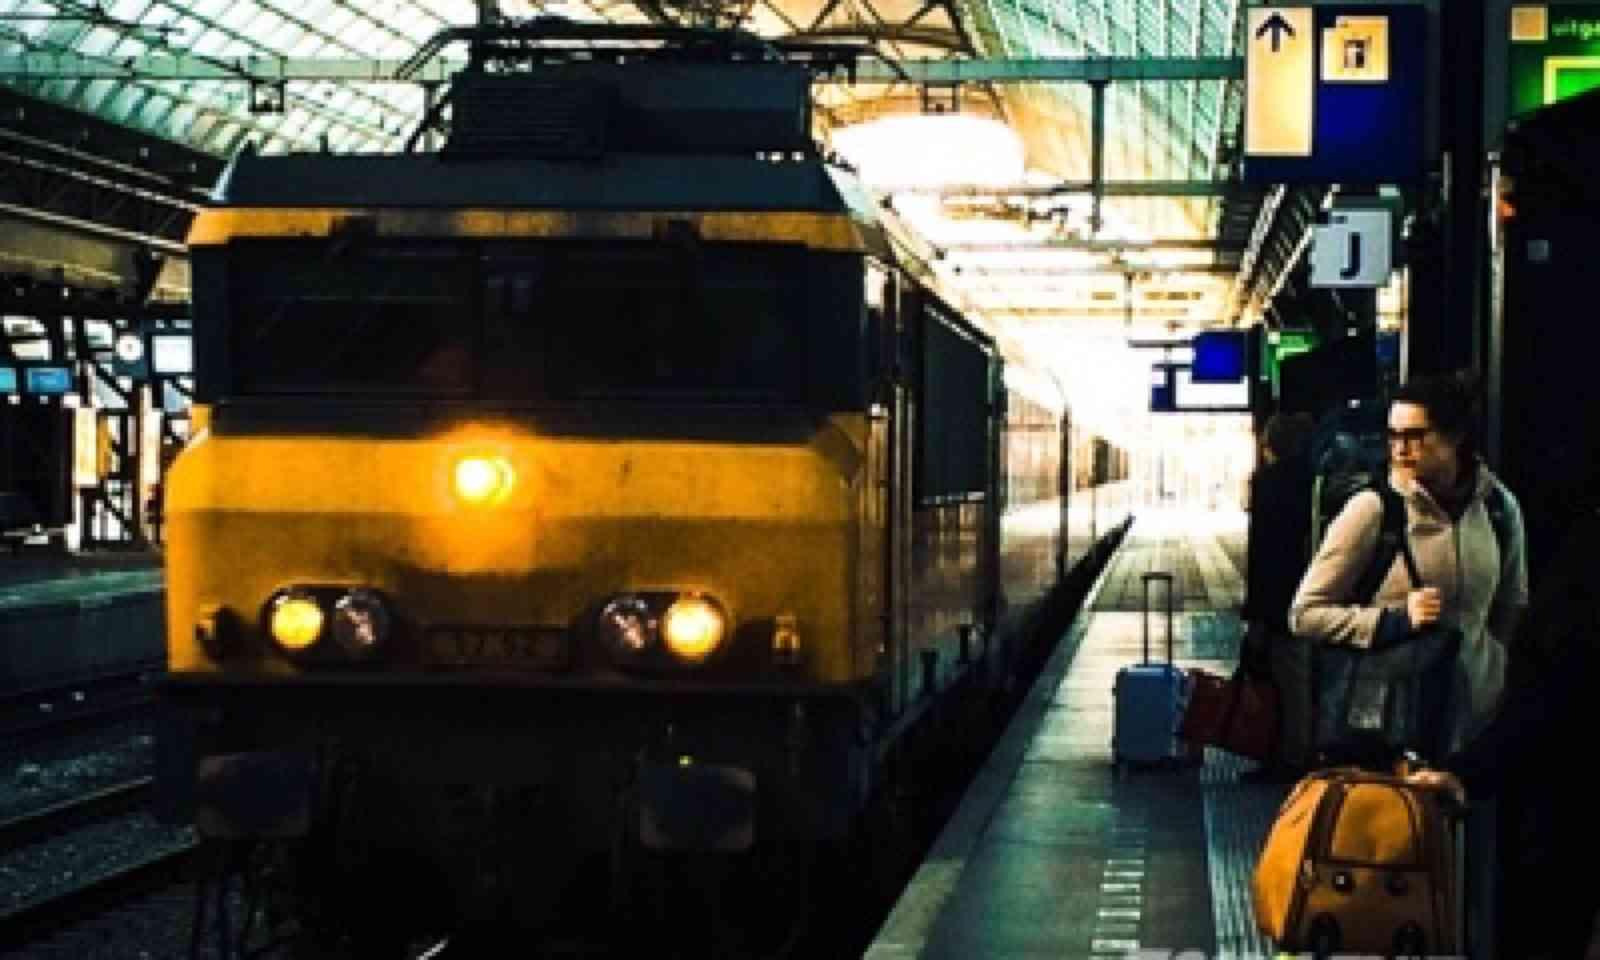 Amsterdam Centraal (Matthew Woodward)